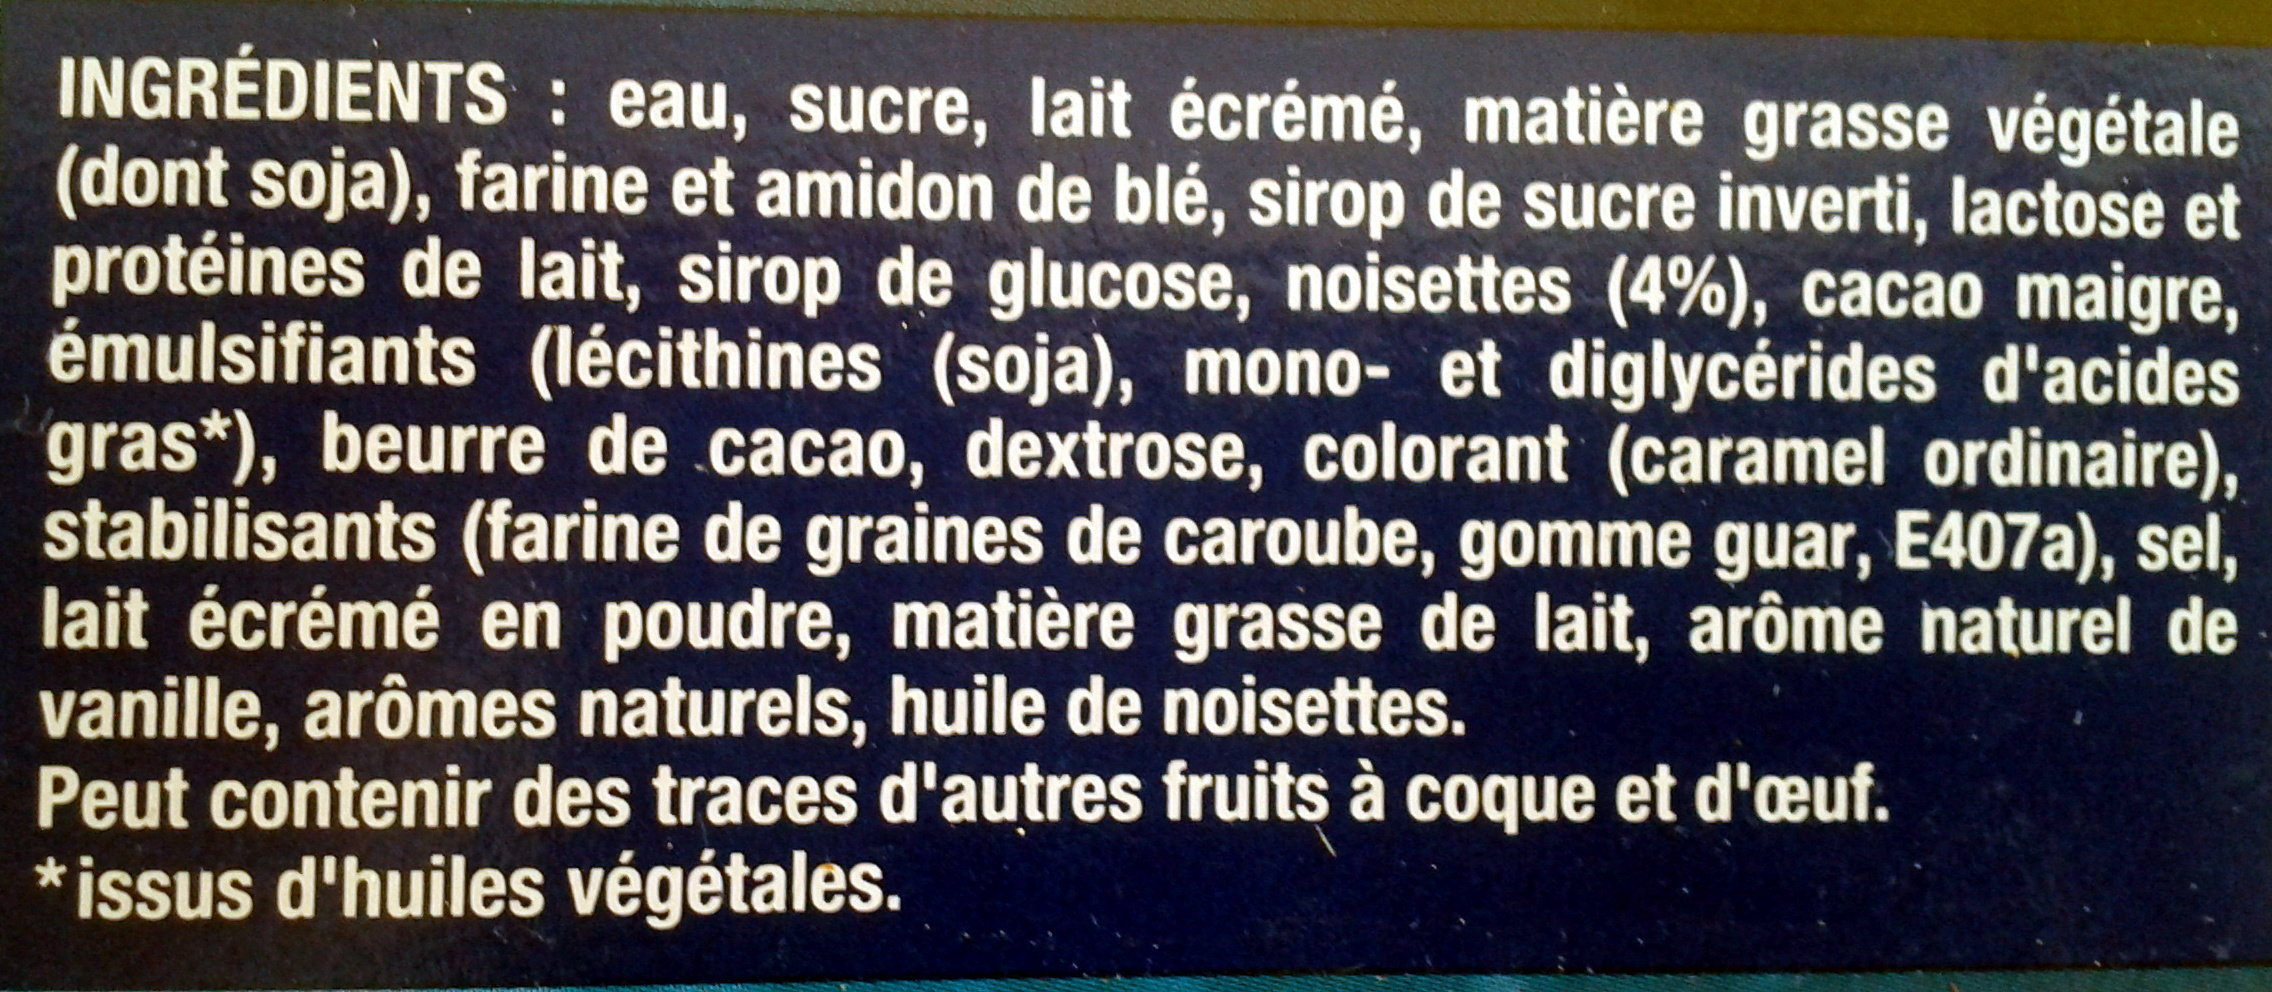 Extrême vanille praliné - Ingrédients - fr